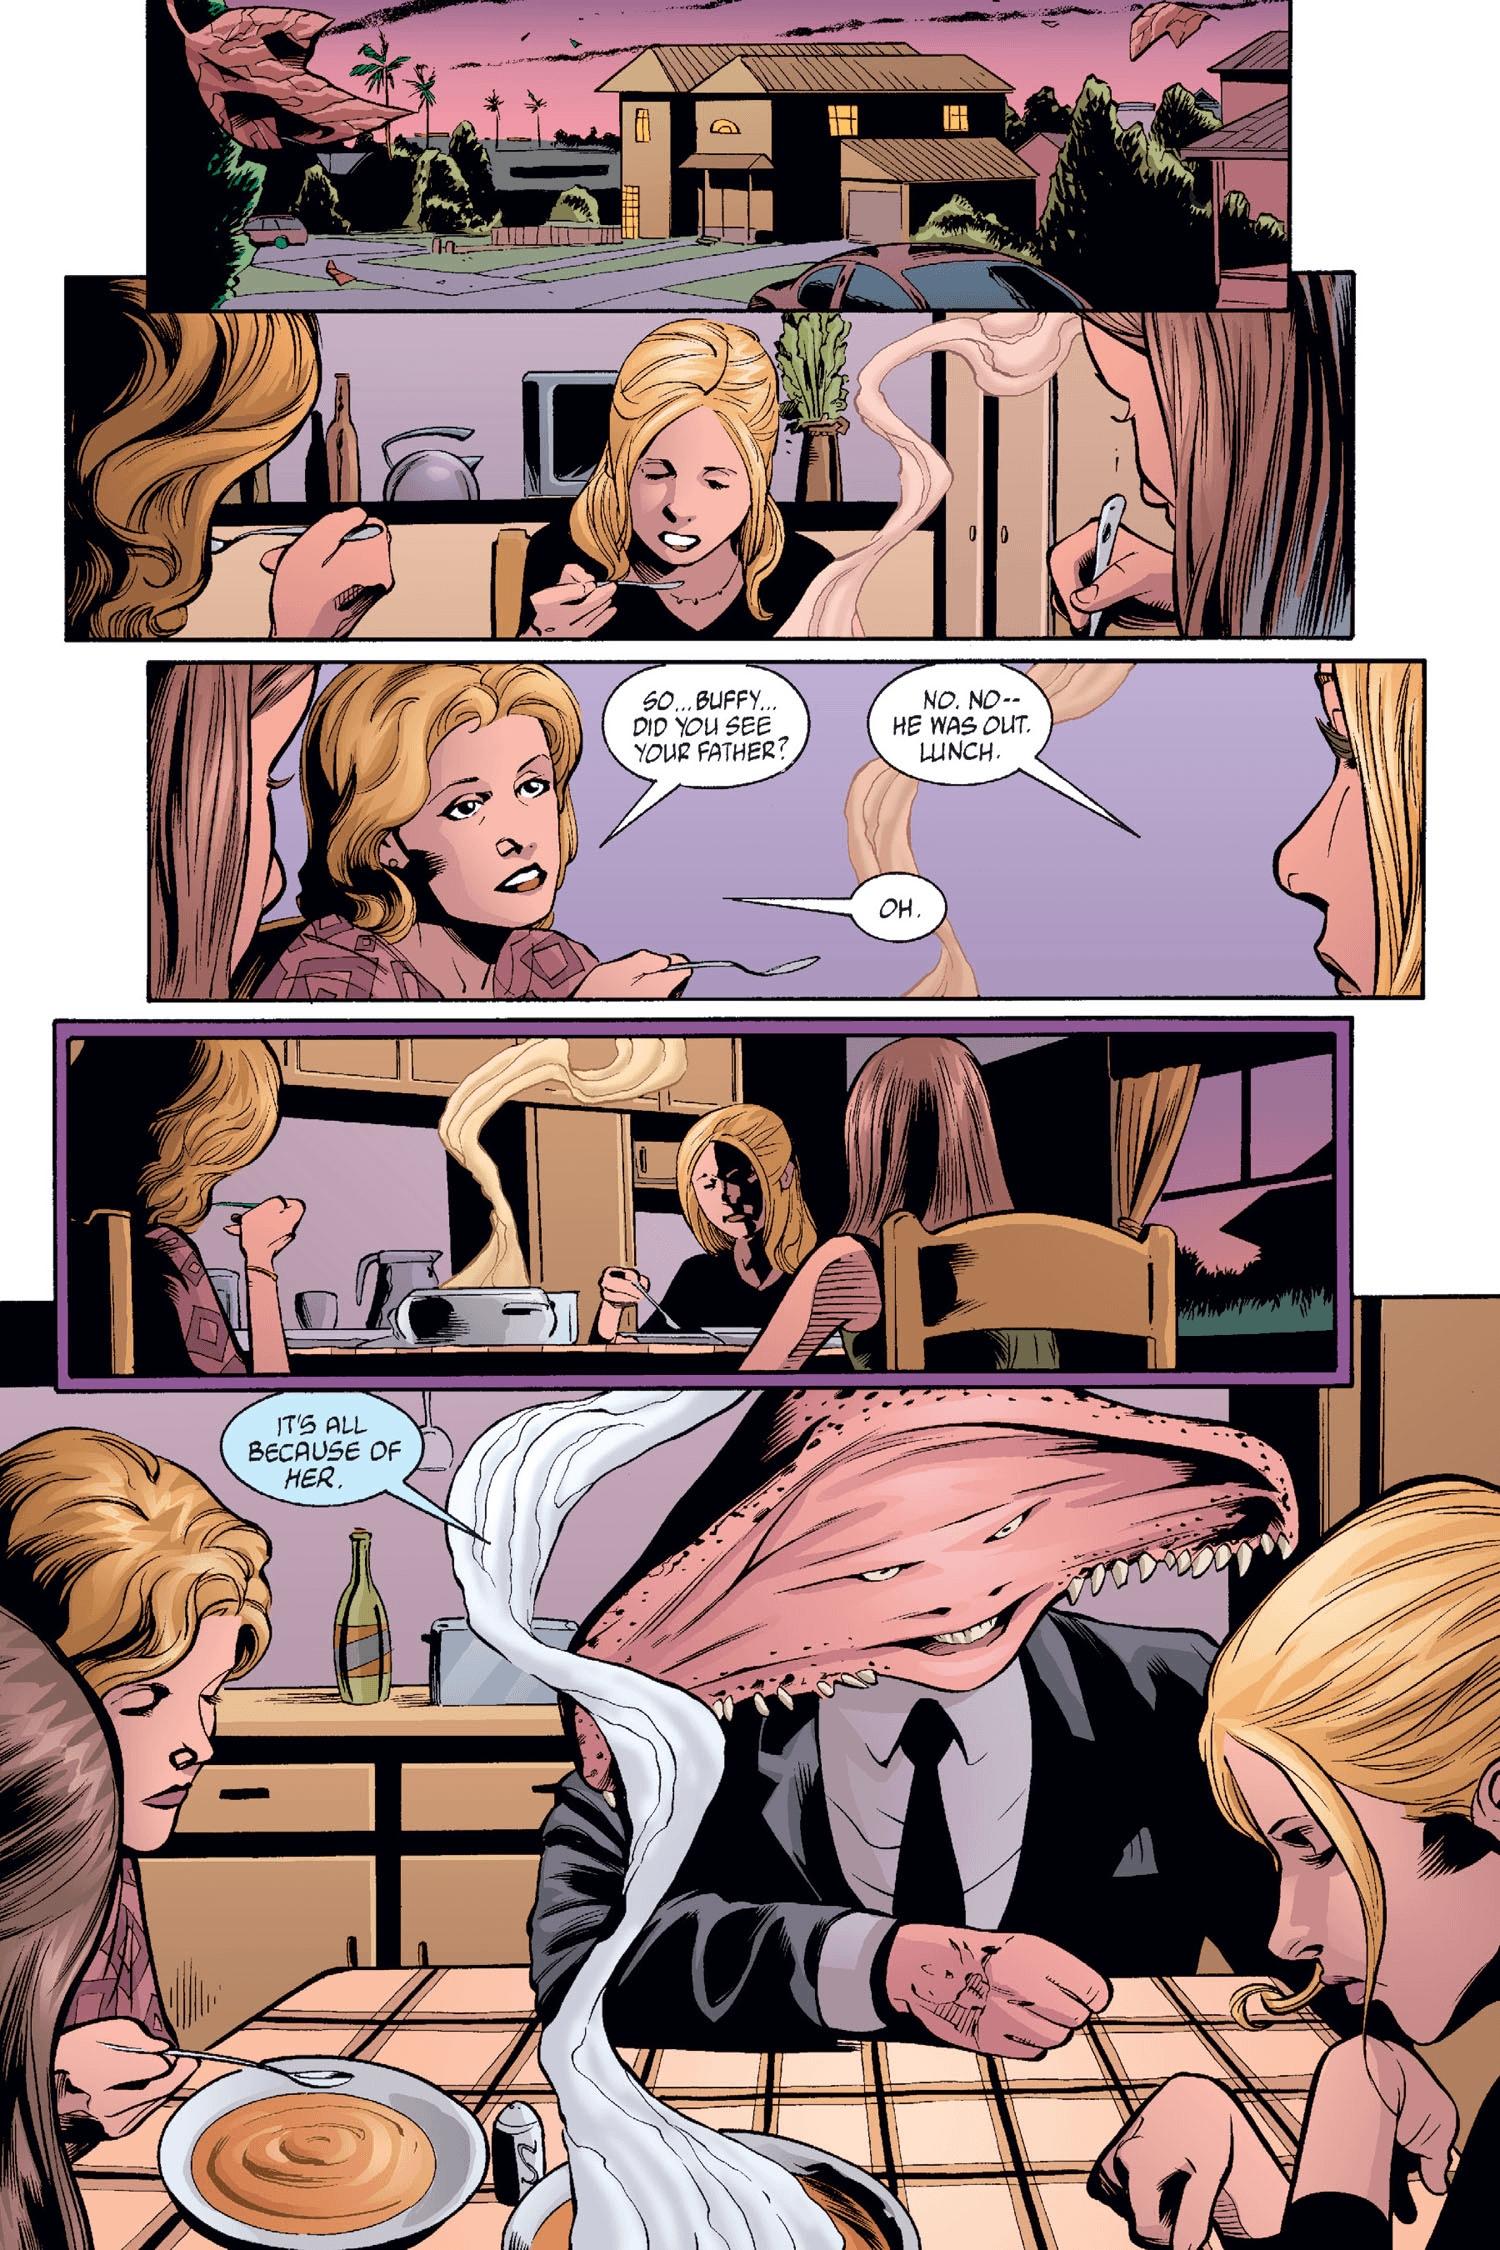 Read online Buffy the Vampire Slayer: Omnibus comic -  Issue # TPB 2 - 35